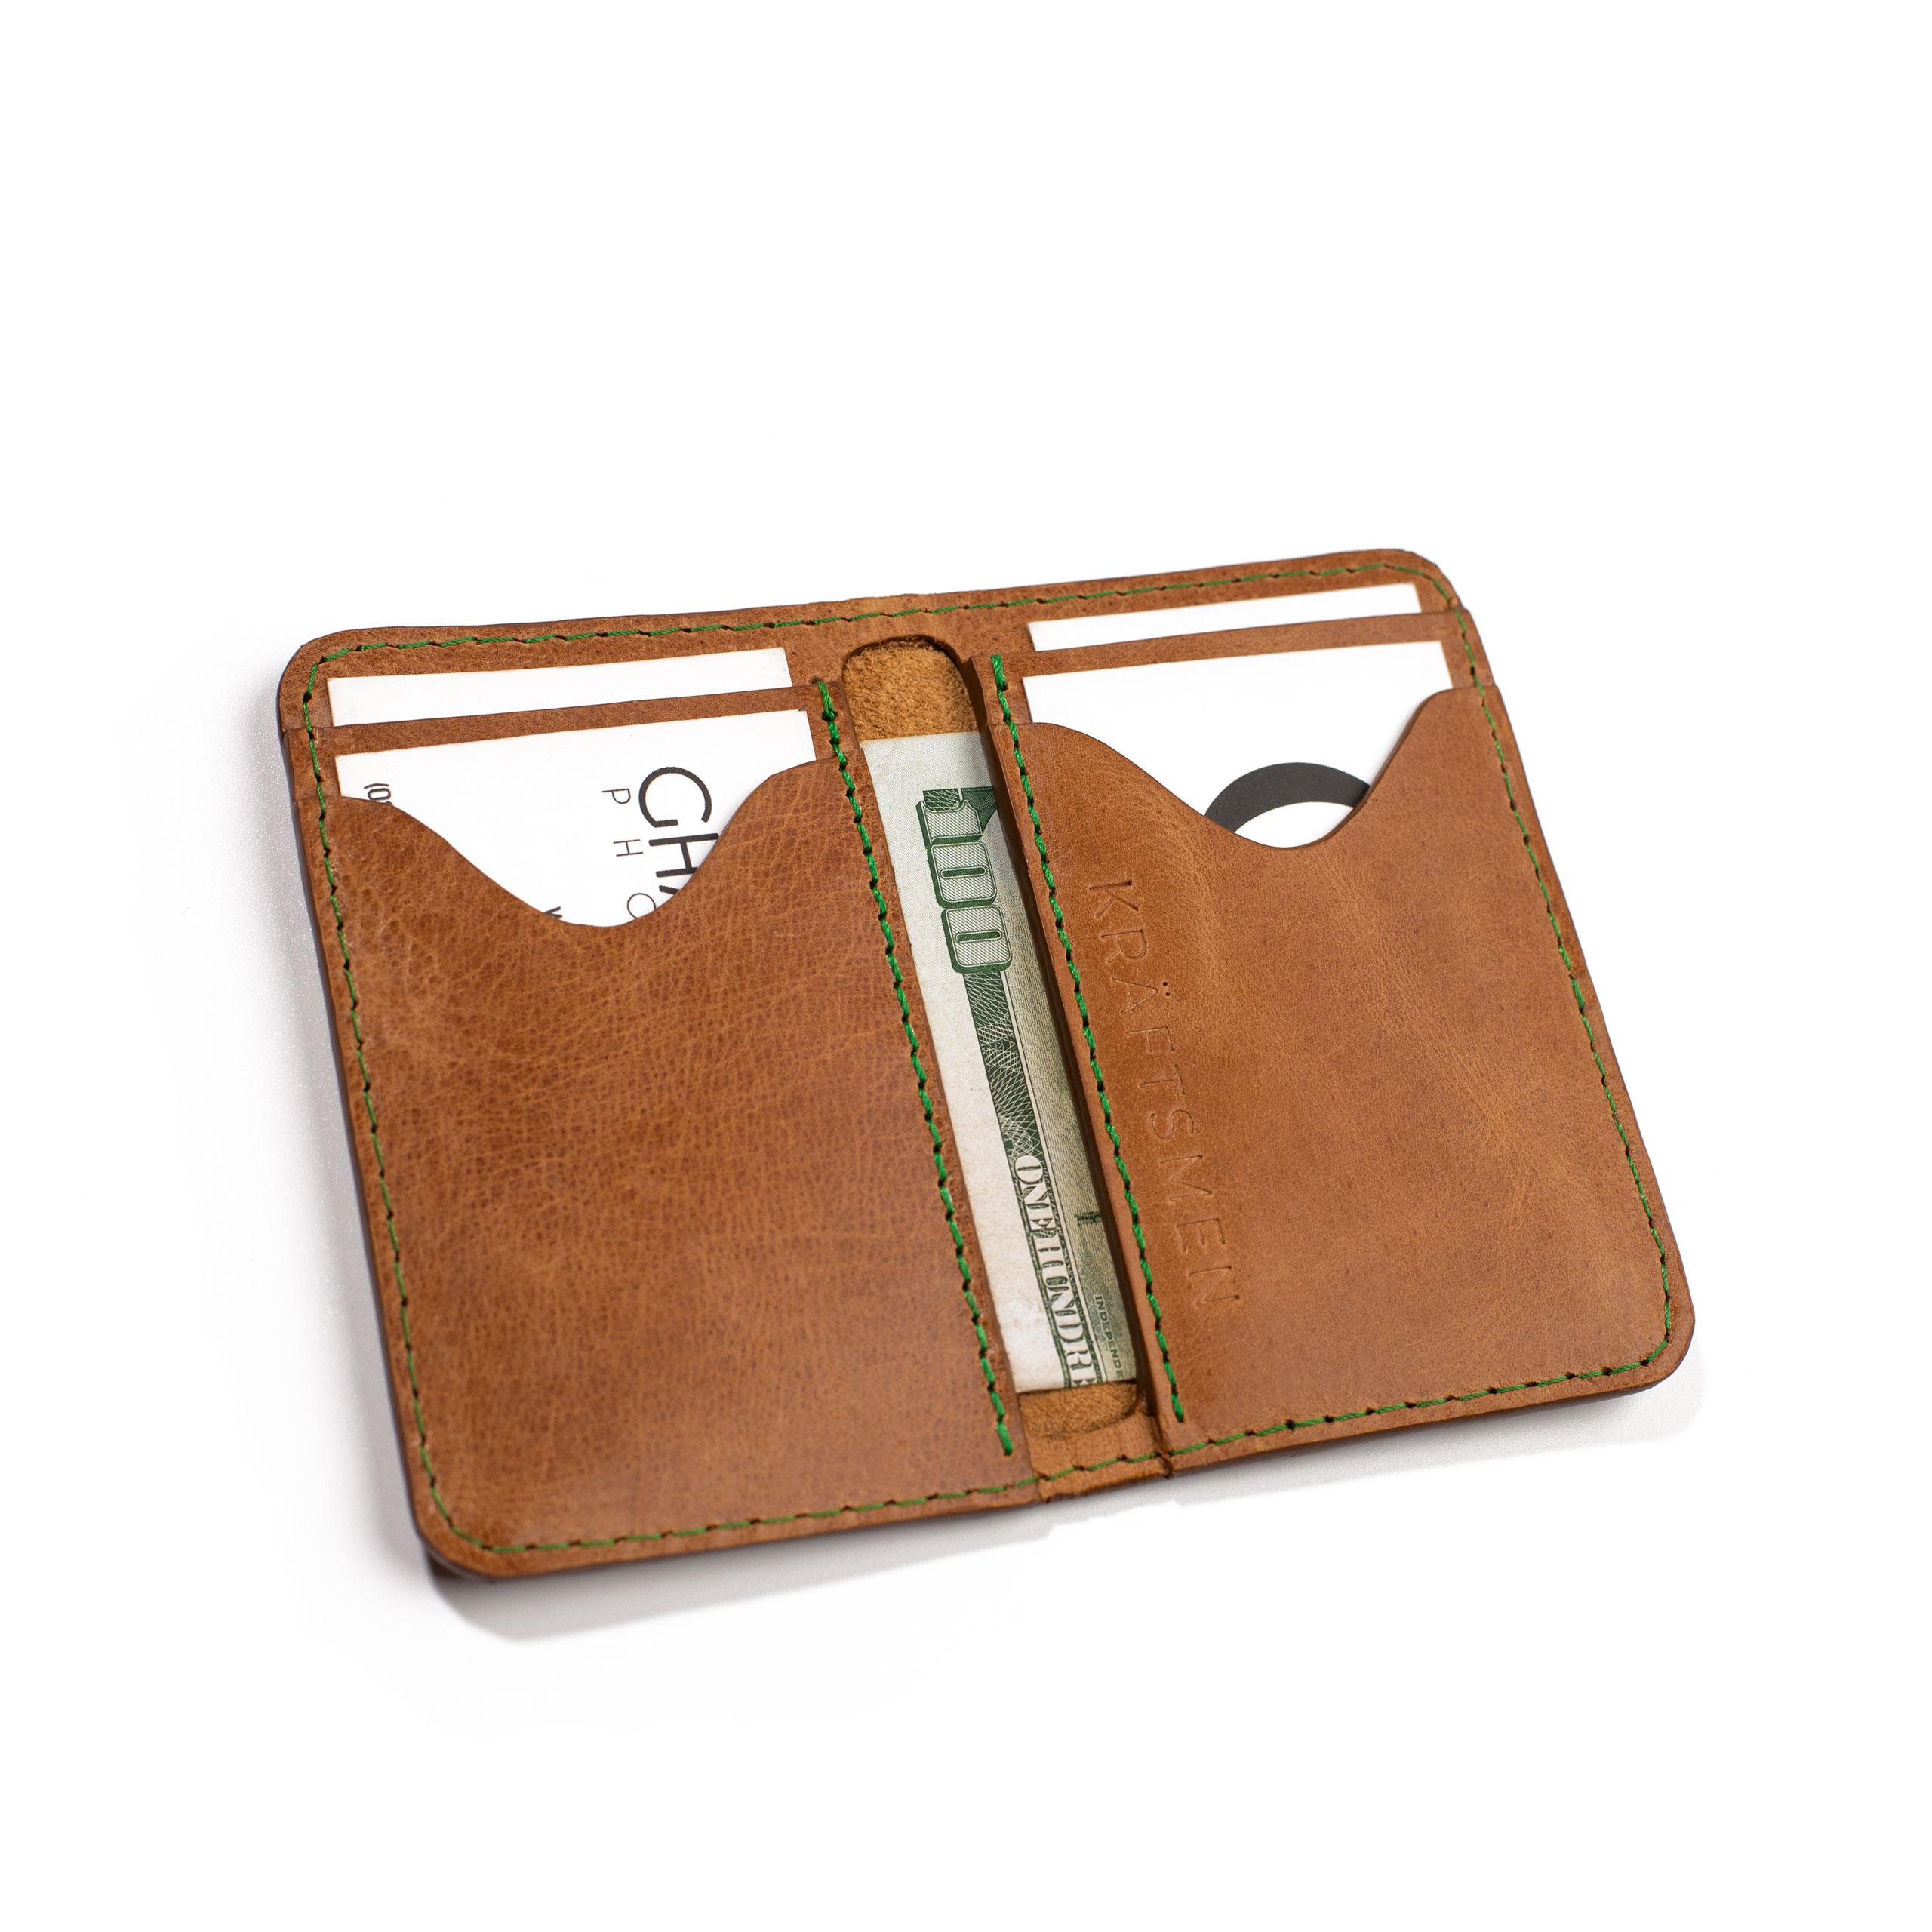 Italian Leather Card Holder by Kraftsmen